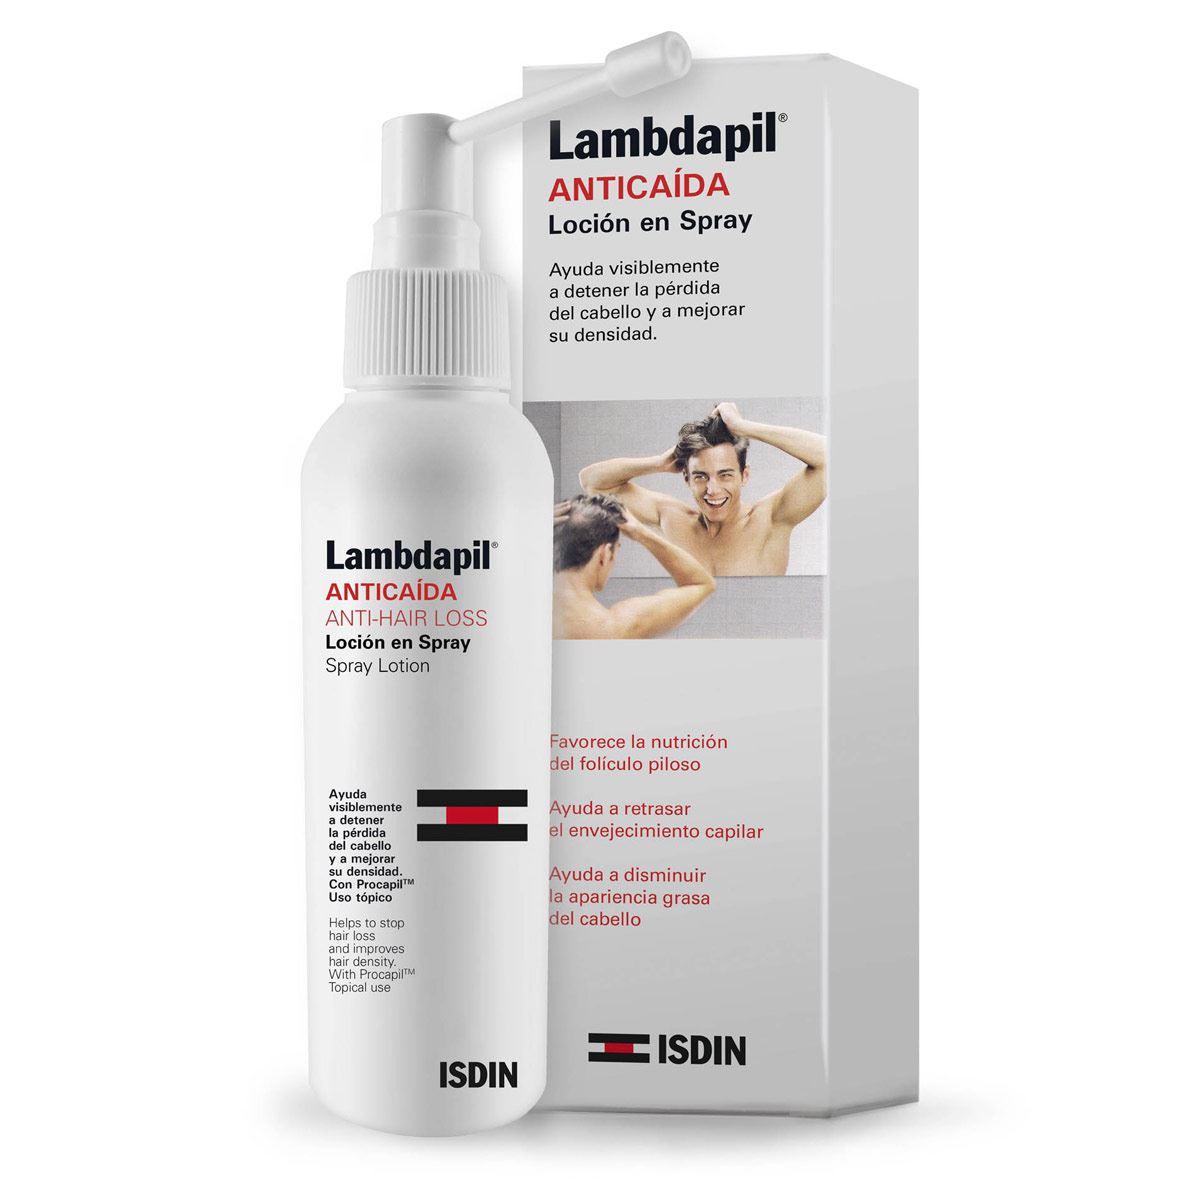 Comprar Lambdapil Anticaid Loc Spray 125 Ml 1 Botella